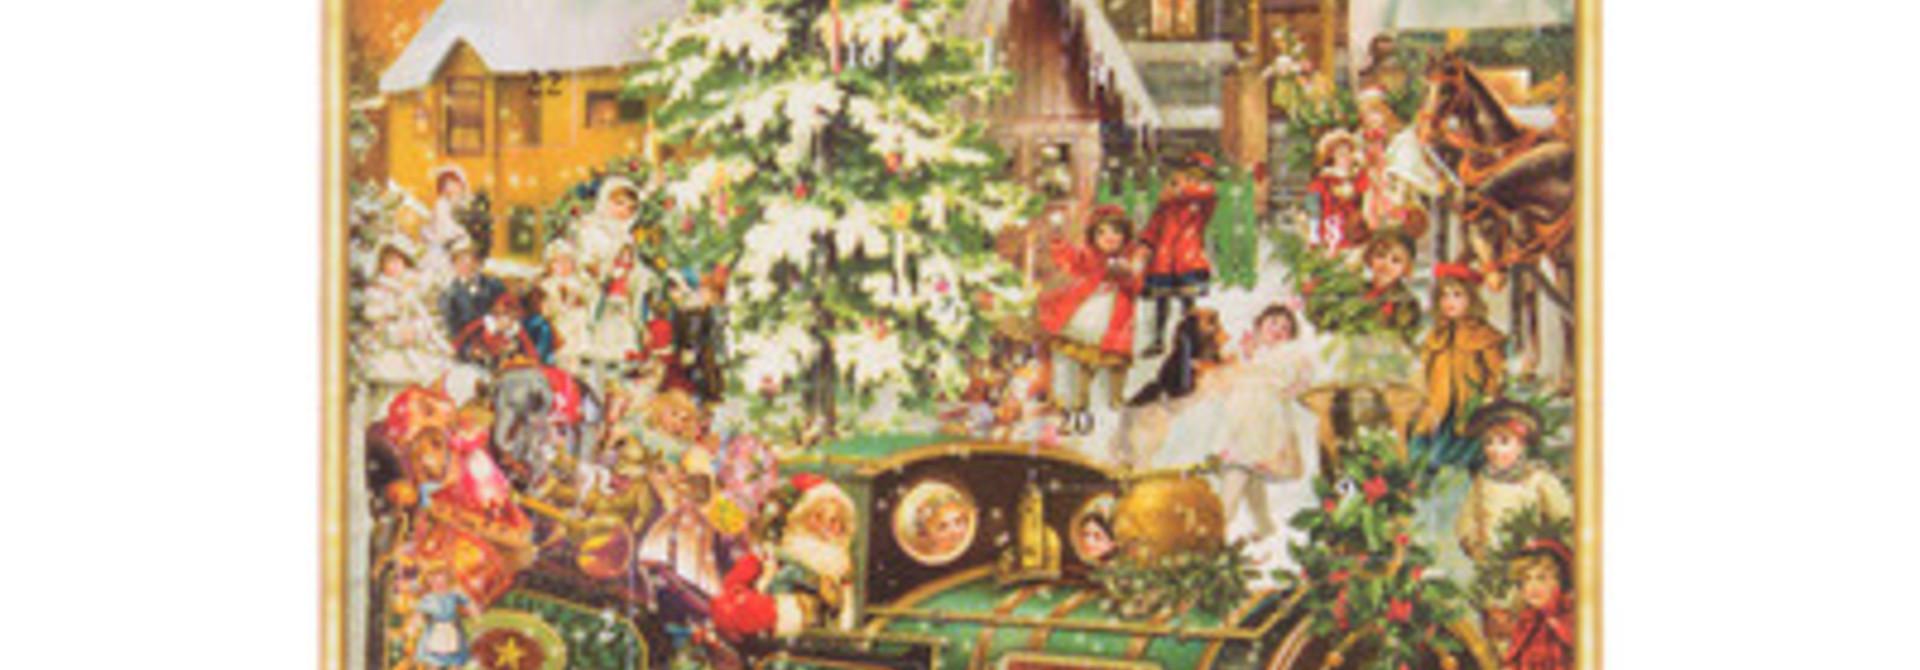 advent kalender groot